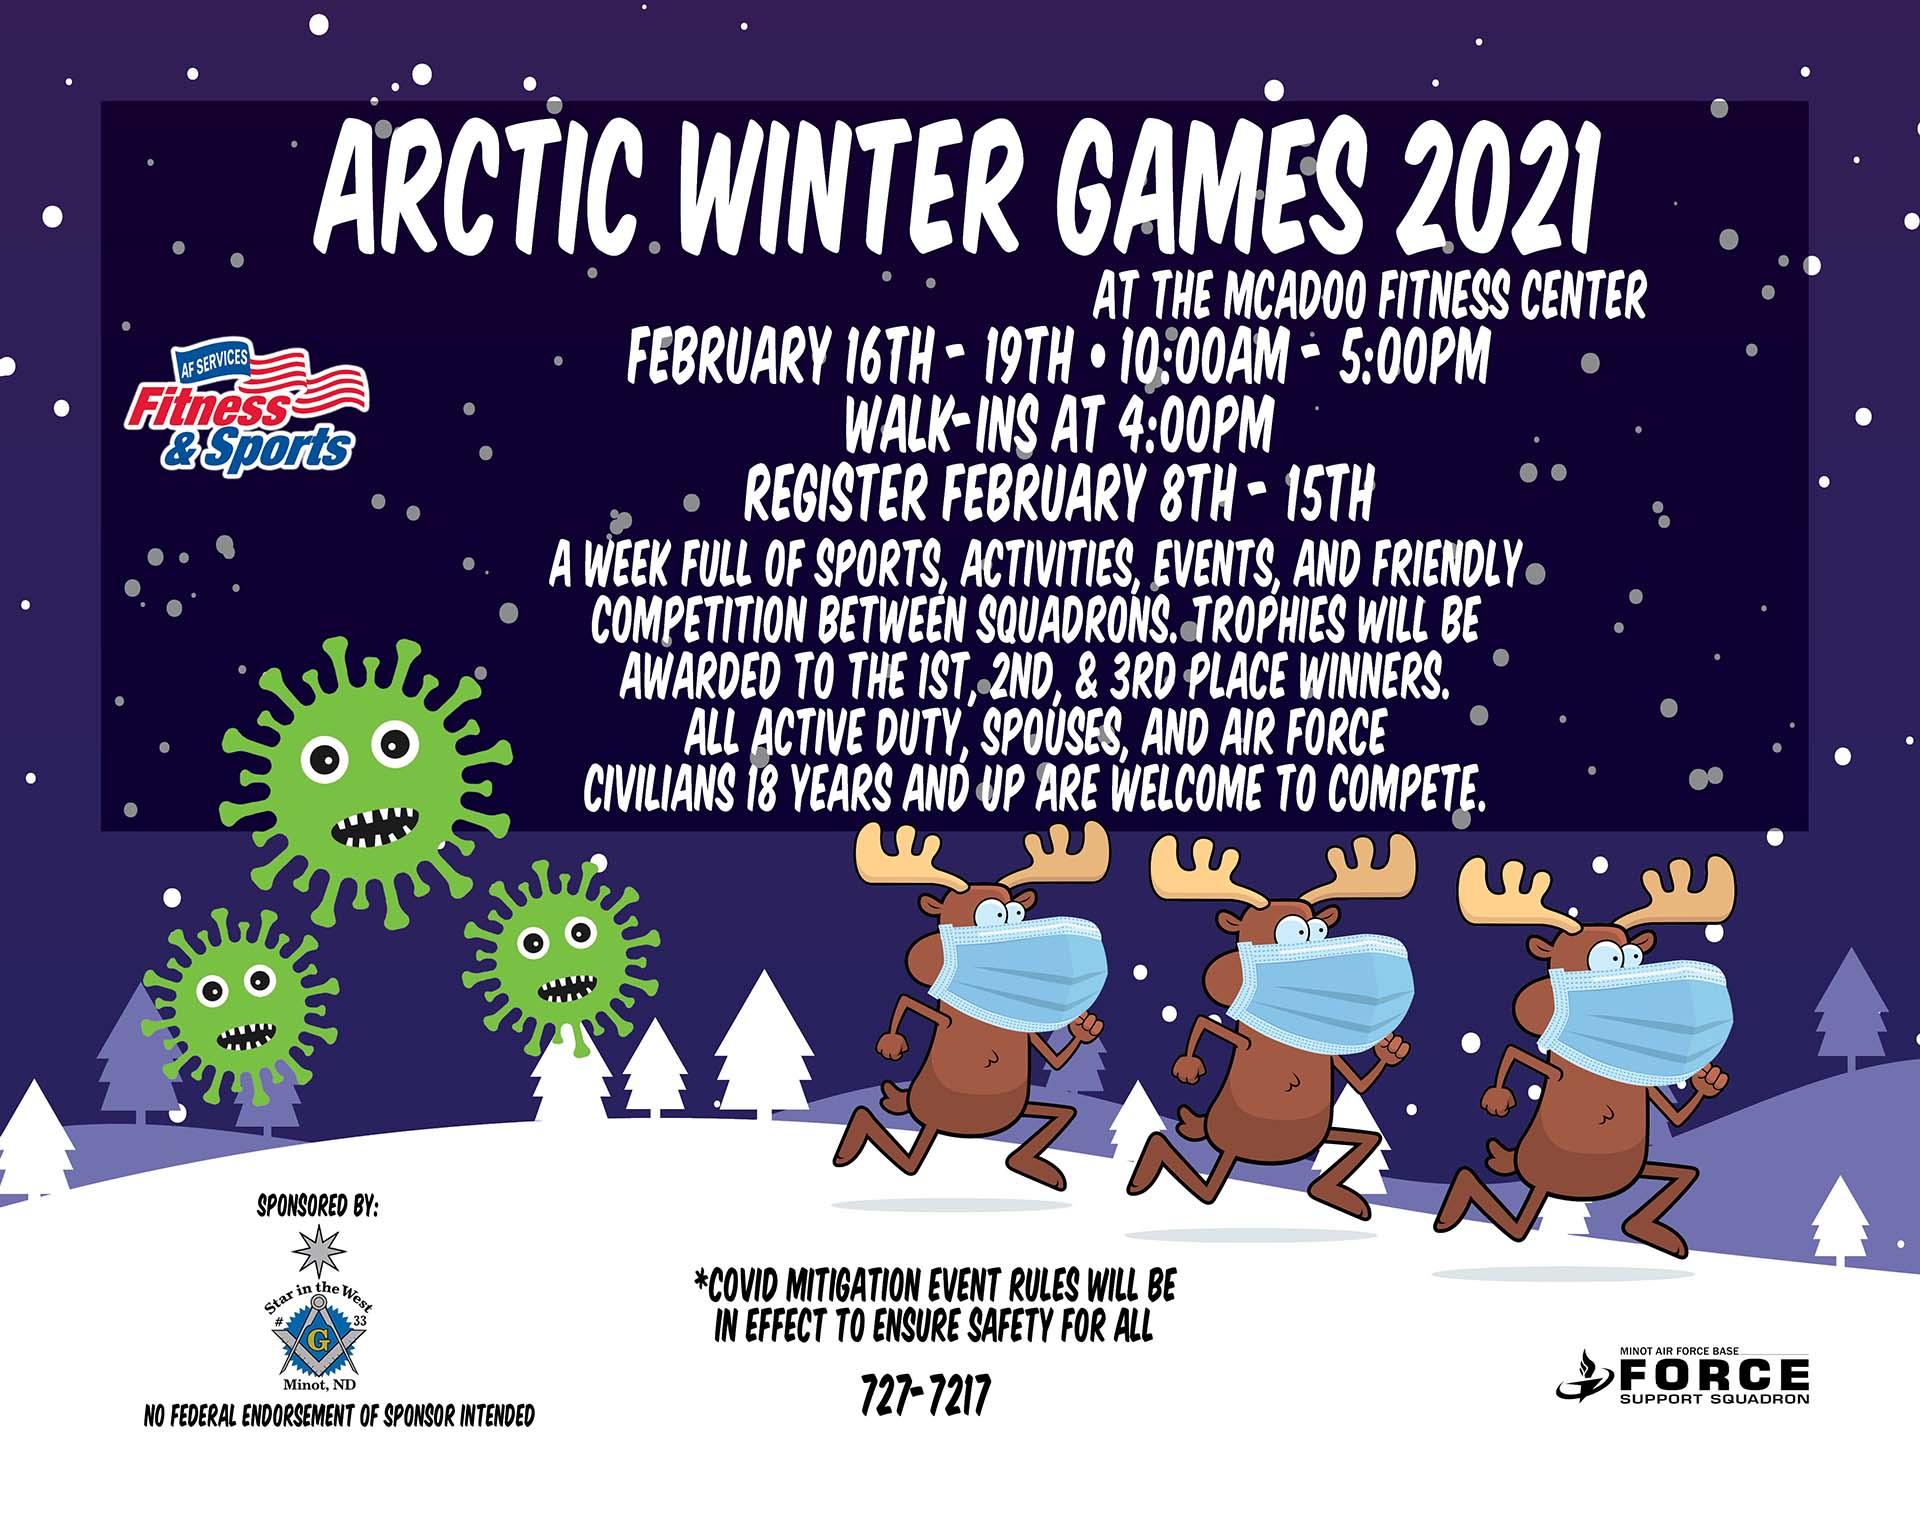 Arctic Winter Games 2021